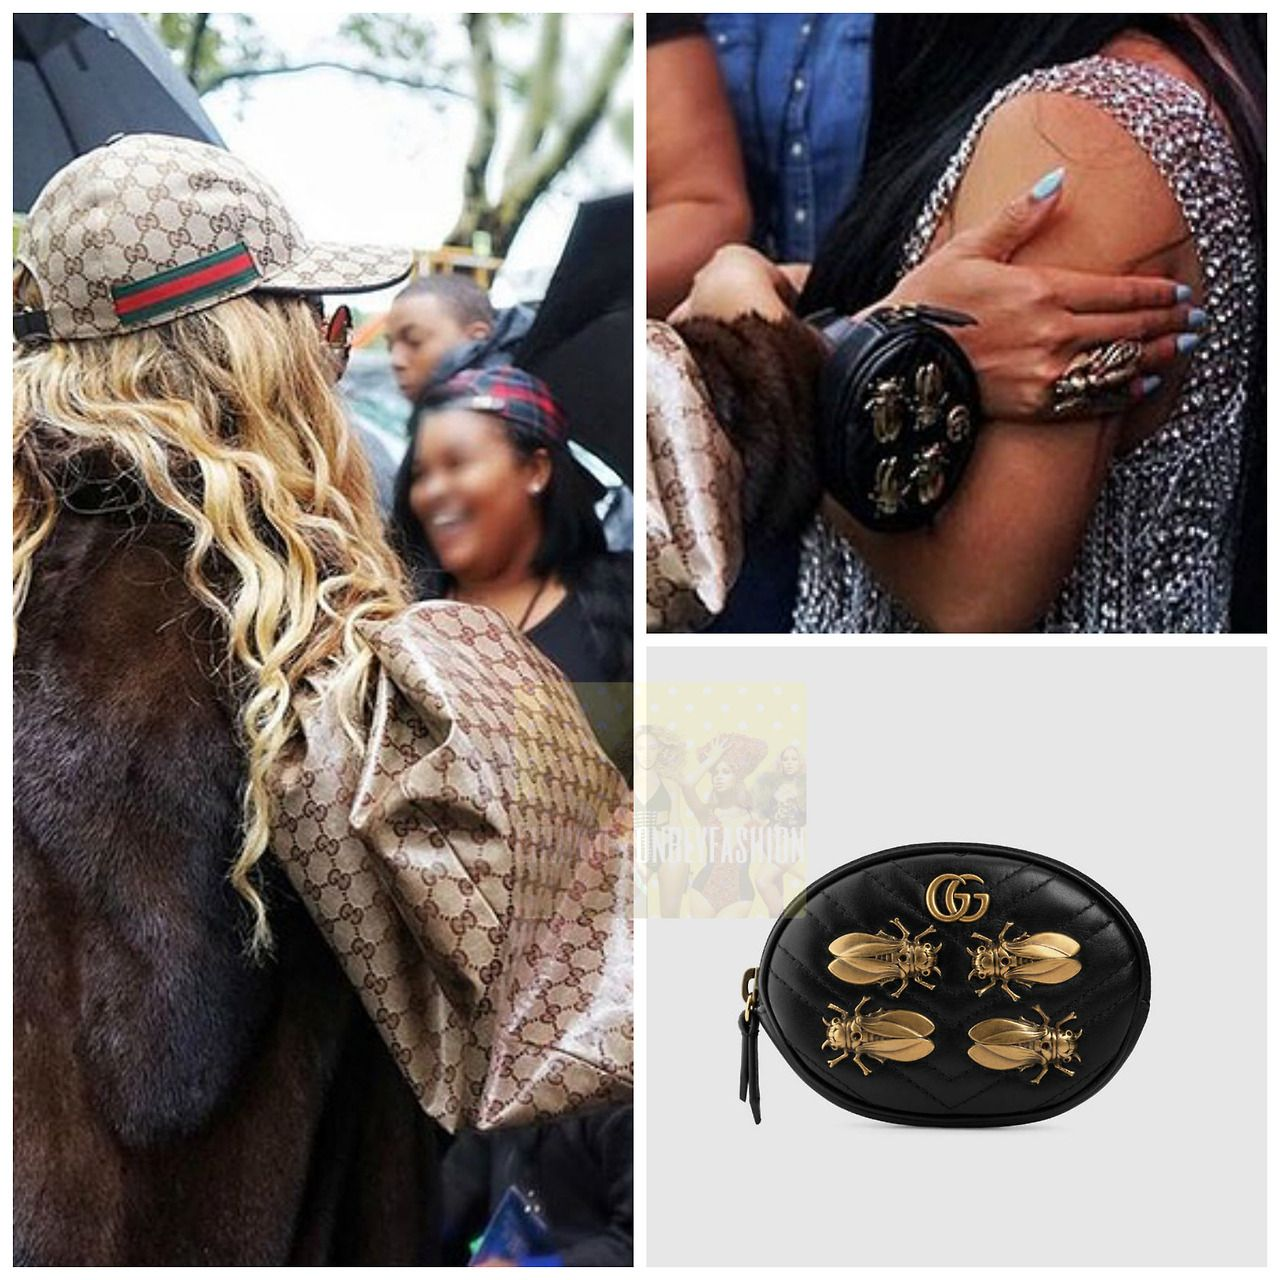 76652b02458c Gucci gg marmont animal studs wrist pouch ($520)   BaddieBey   Gucci ...